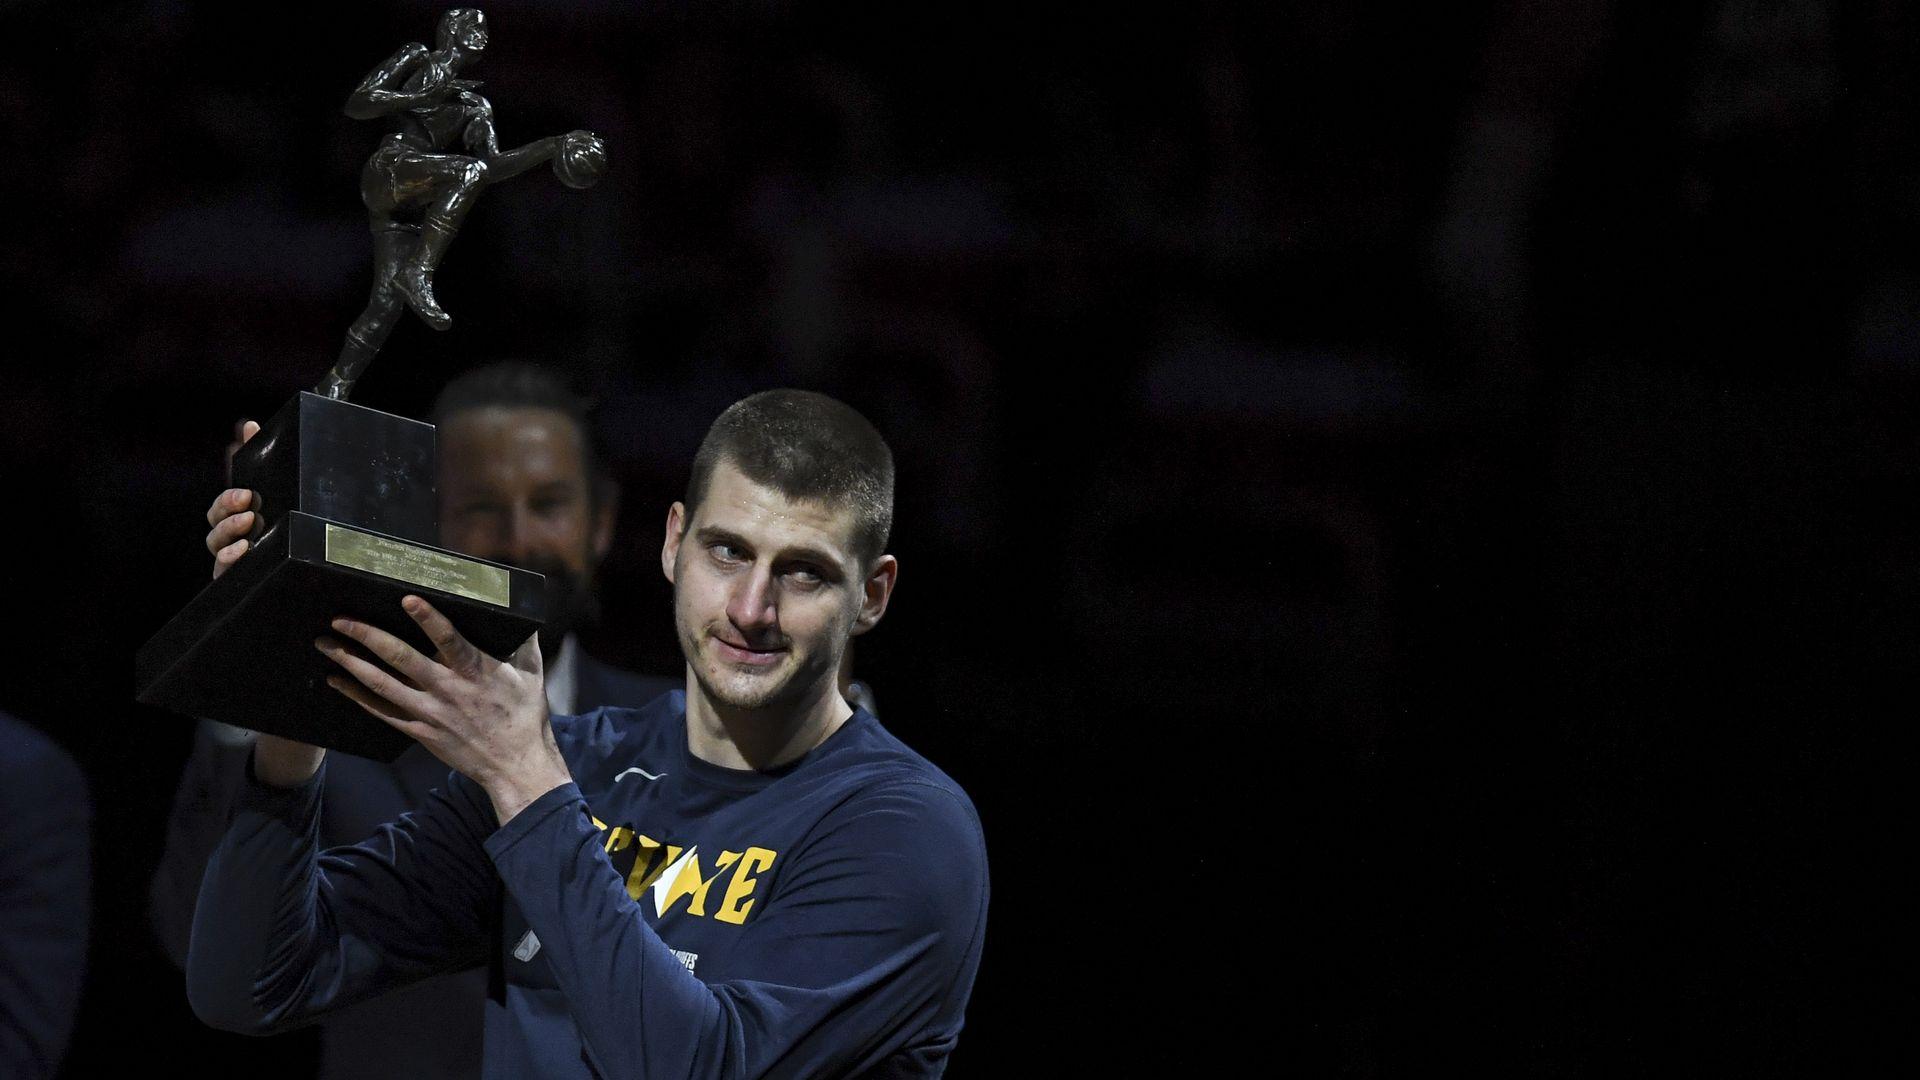 Nikola Jokic of the Denver Nuggets hoists his MVP trophy in June.